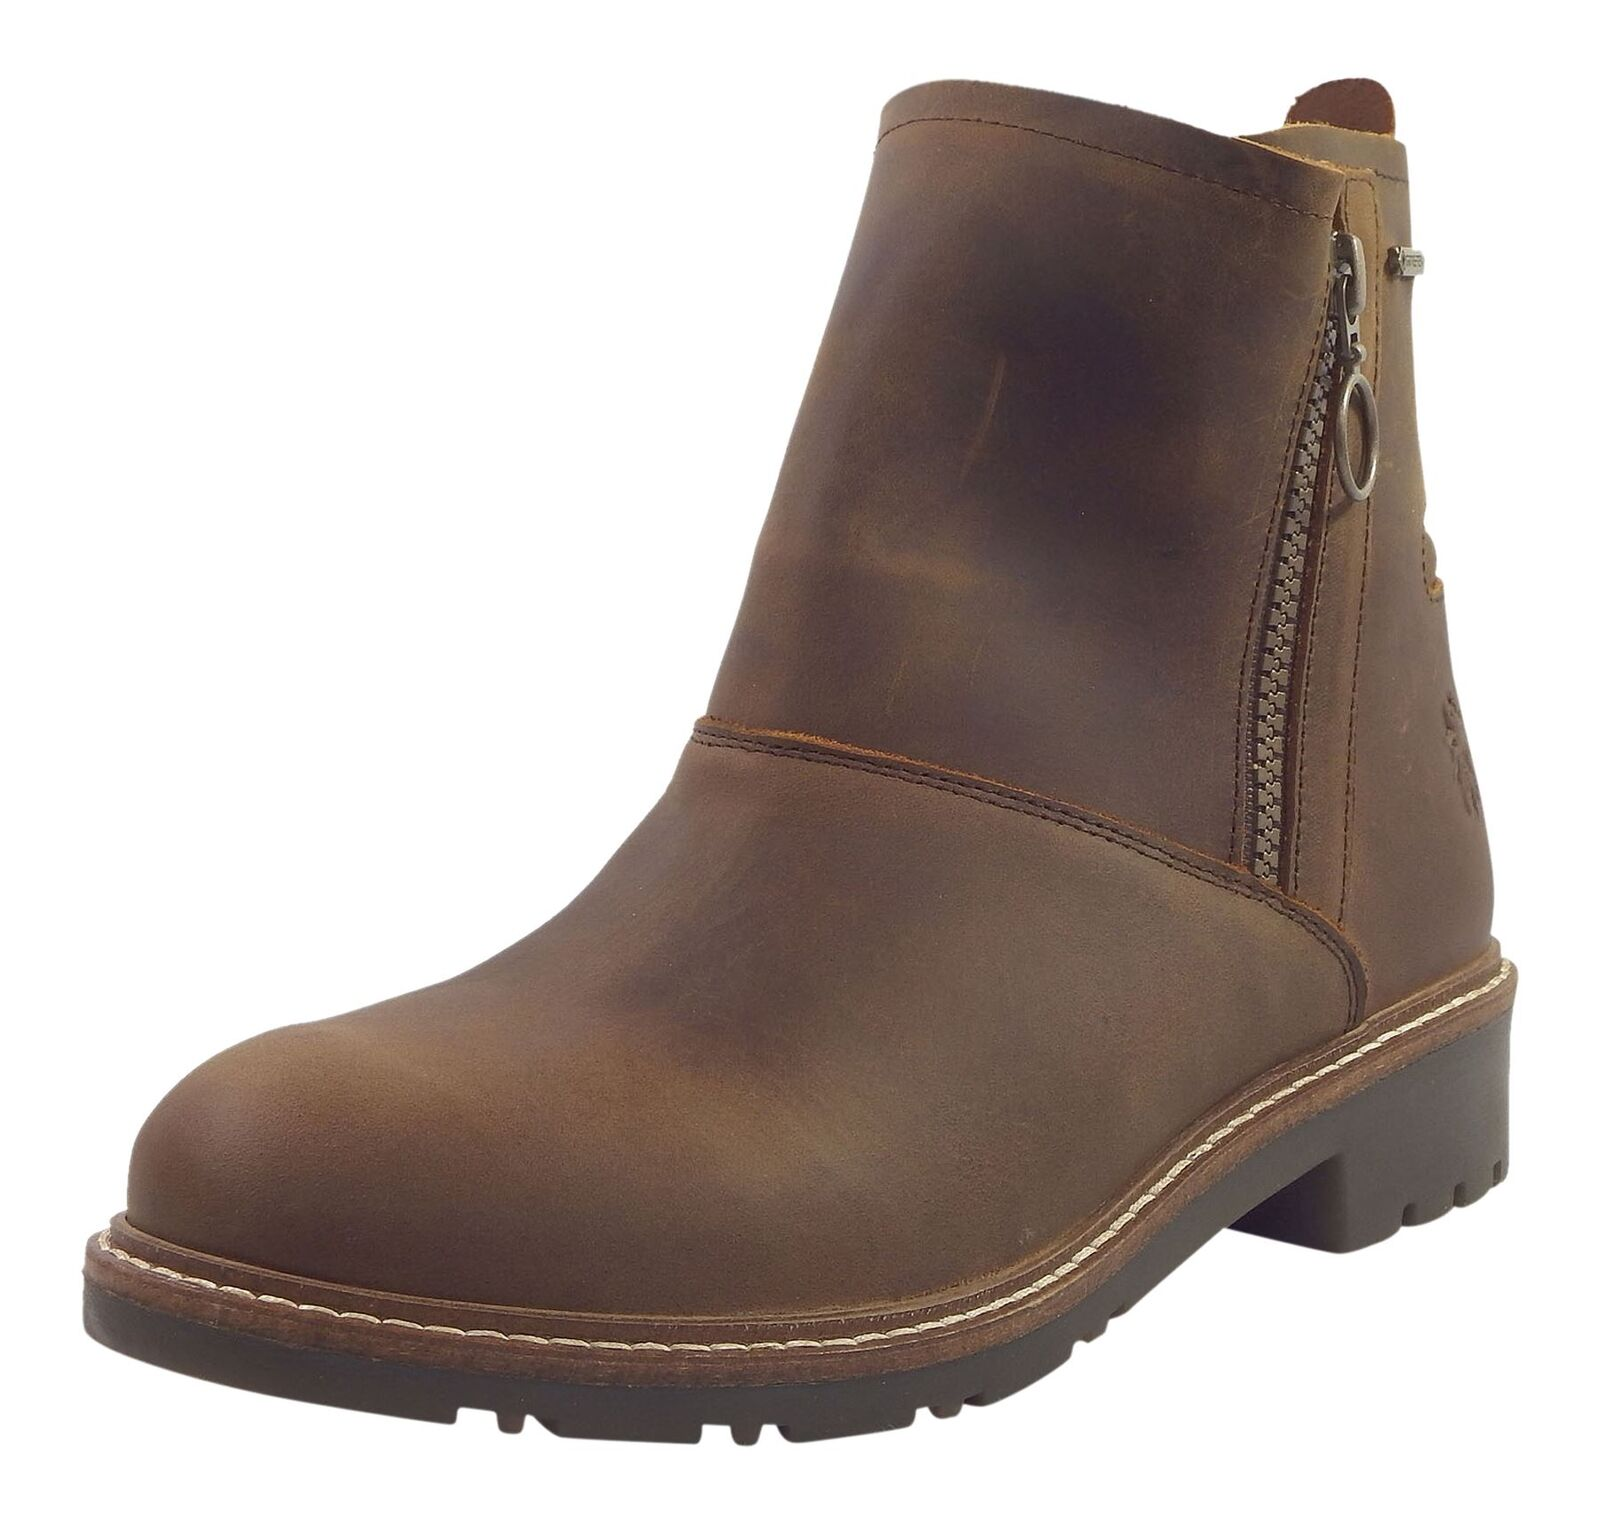 Fly London SHIN054FLY SHIN054FLY SHIN054FLY MOCCA TIMPA Gore-Tex Waterproof Leather Stiefel    ce04e1